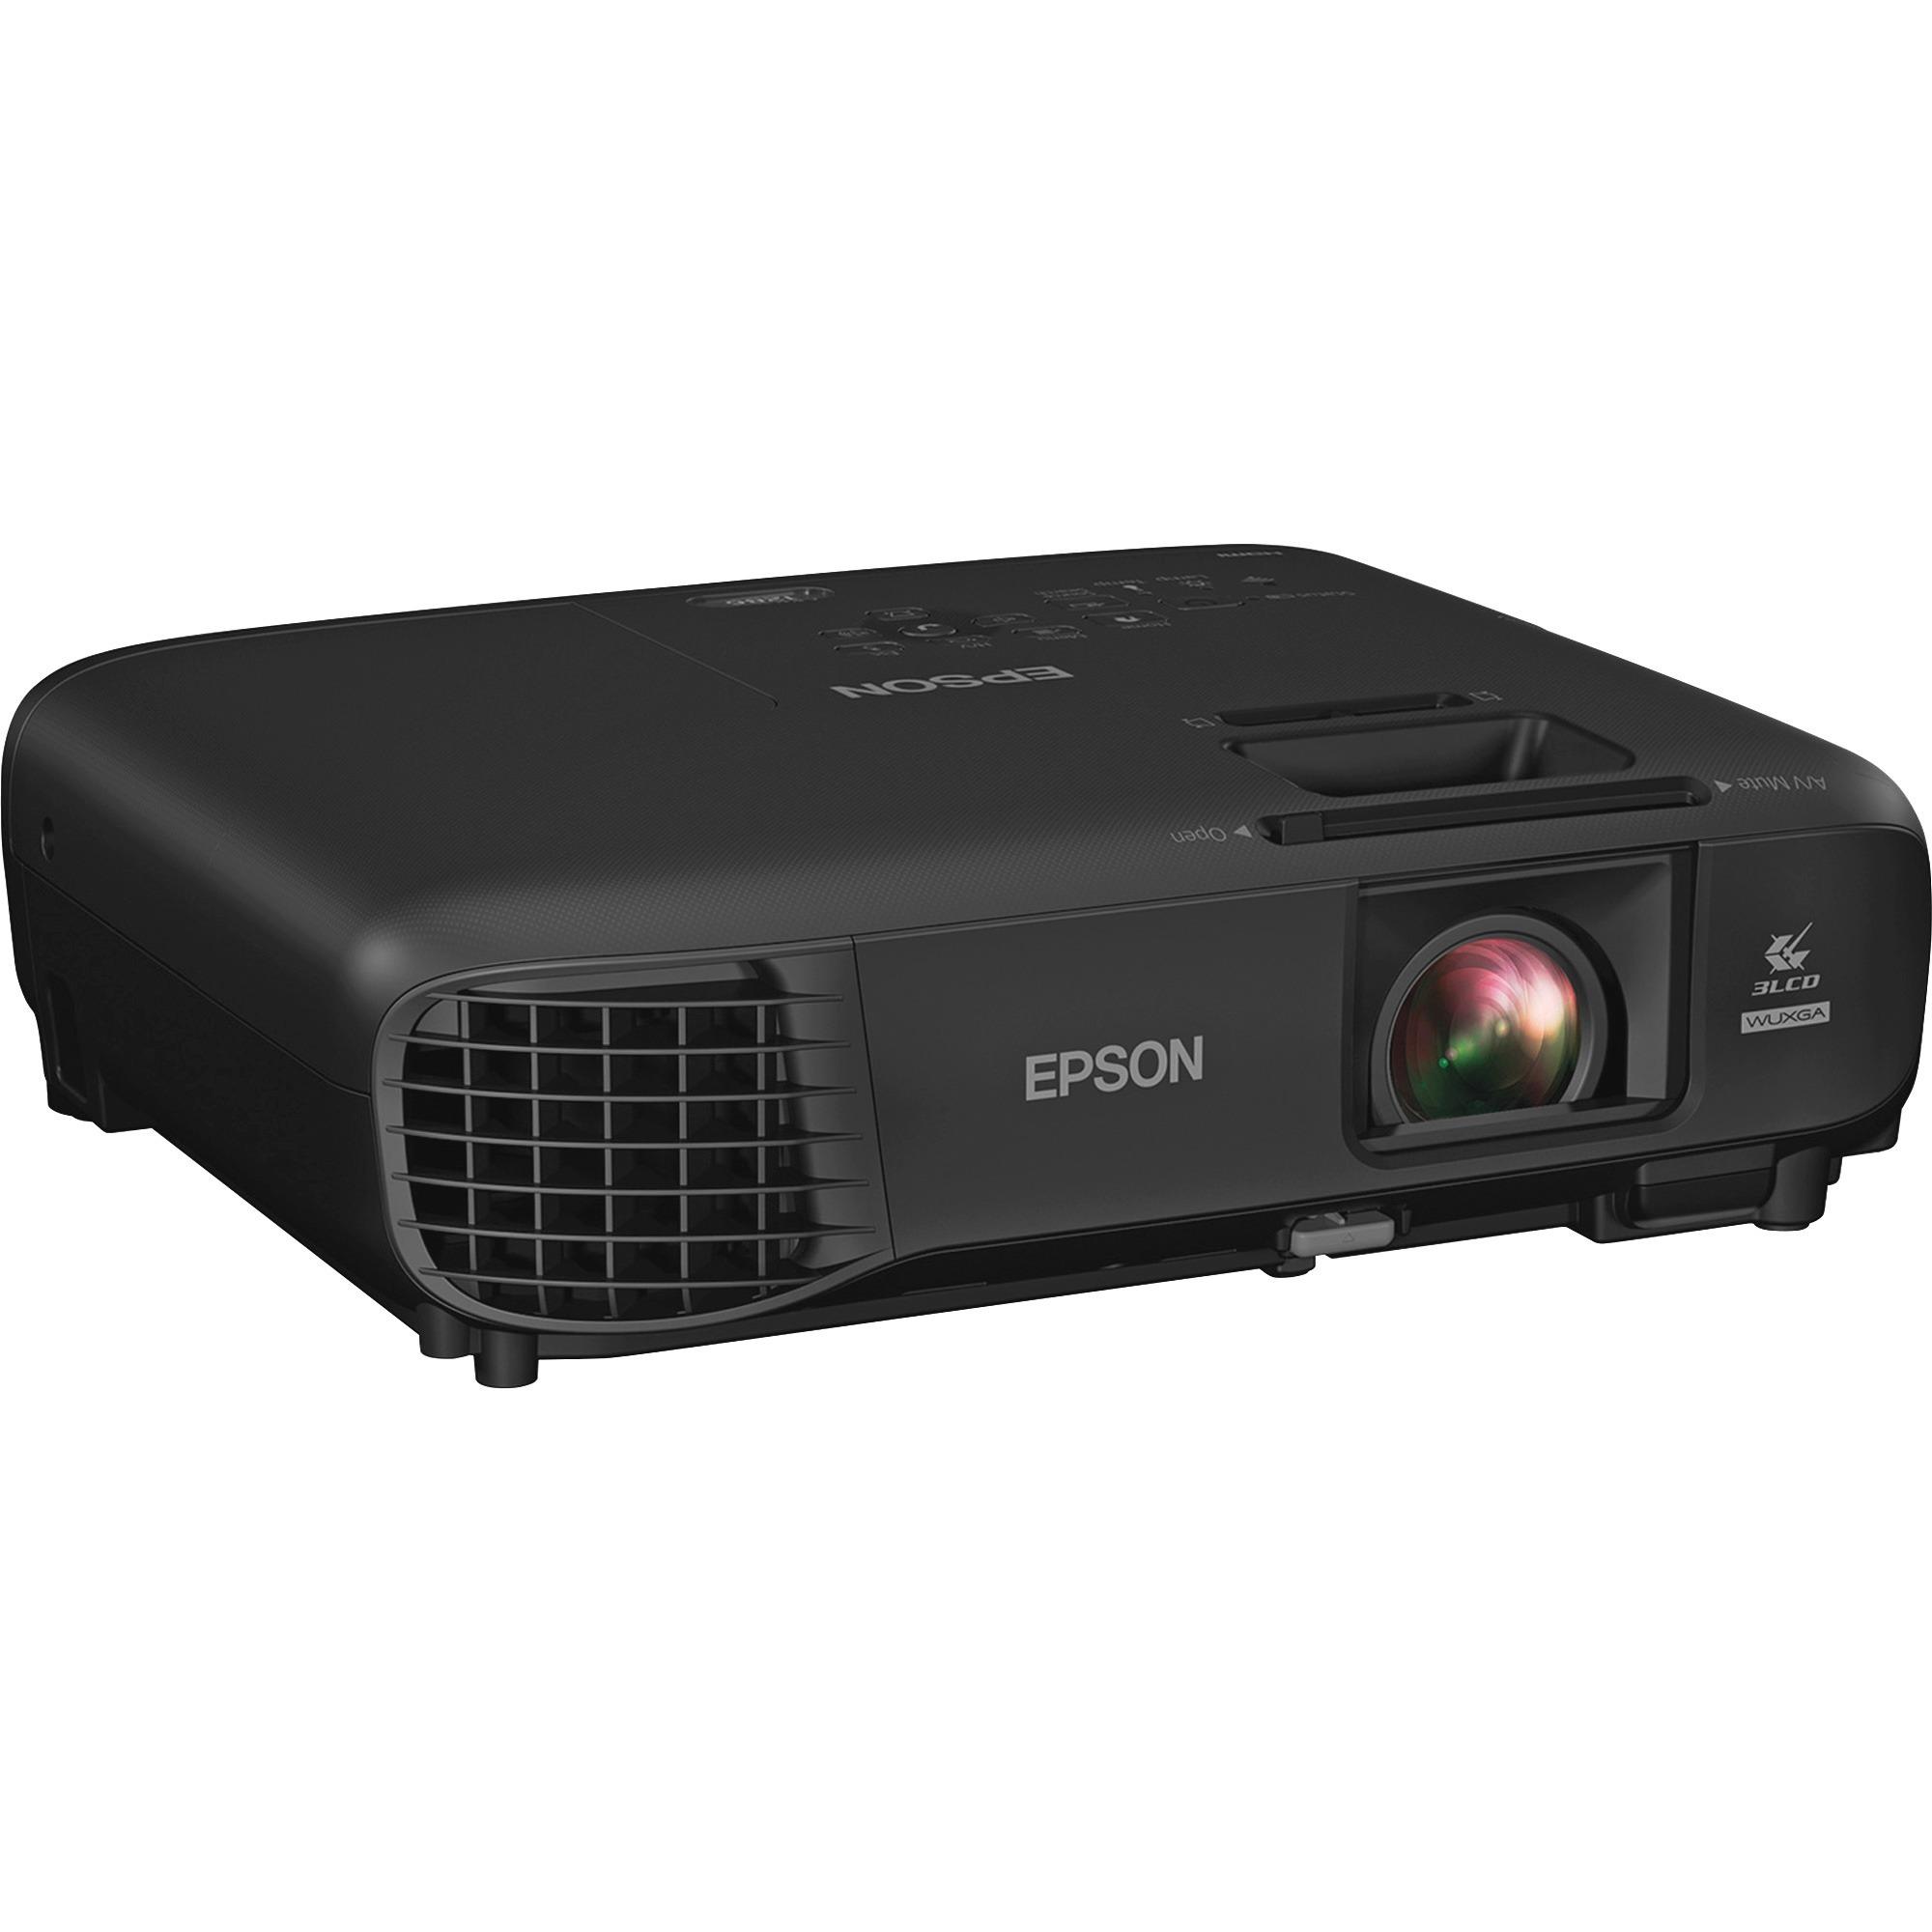 Epson PowerLite 1286 LCD Projector - 16:10_subImage_1